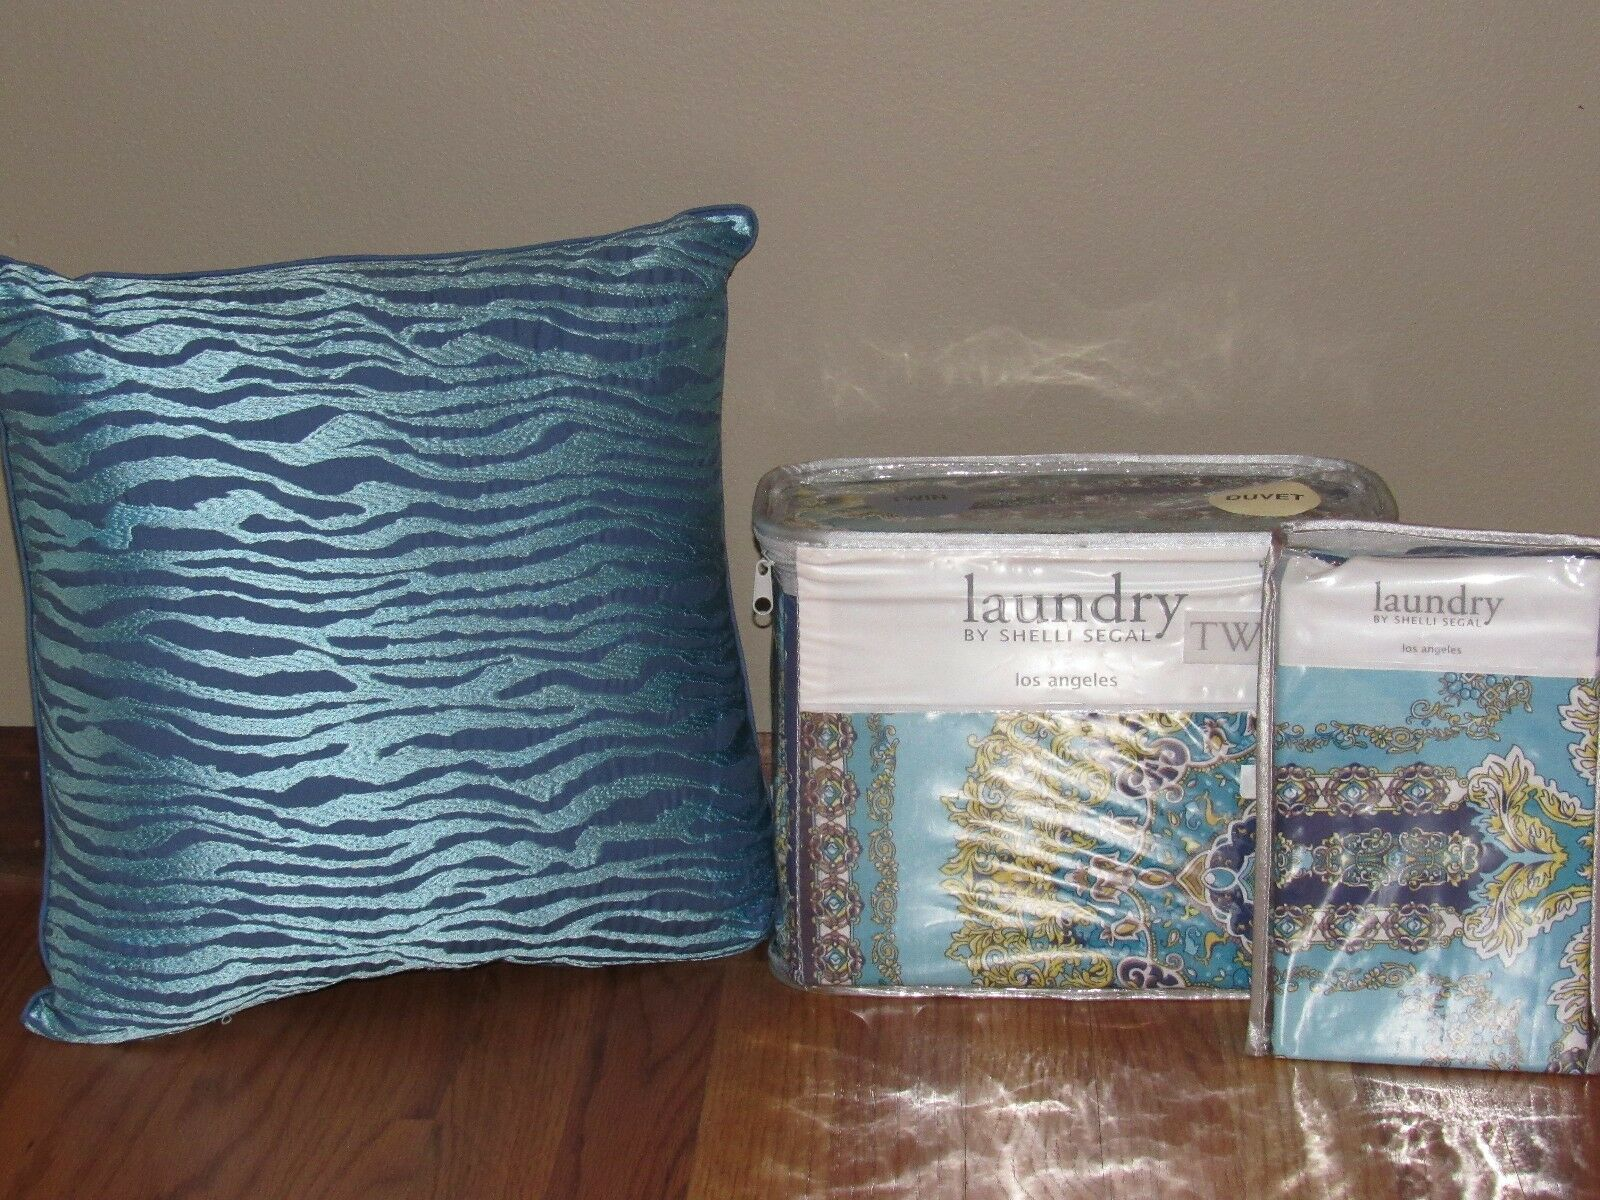 Laundry by SHELLI SEGAL Blau RIVIERA Twin Twin XL DUVET COVER, SHAM PILLOW Dorm